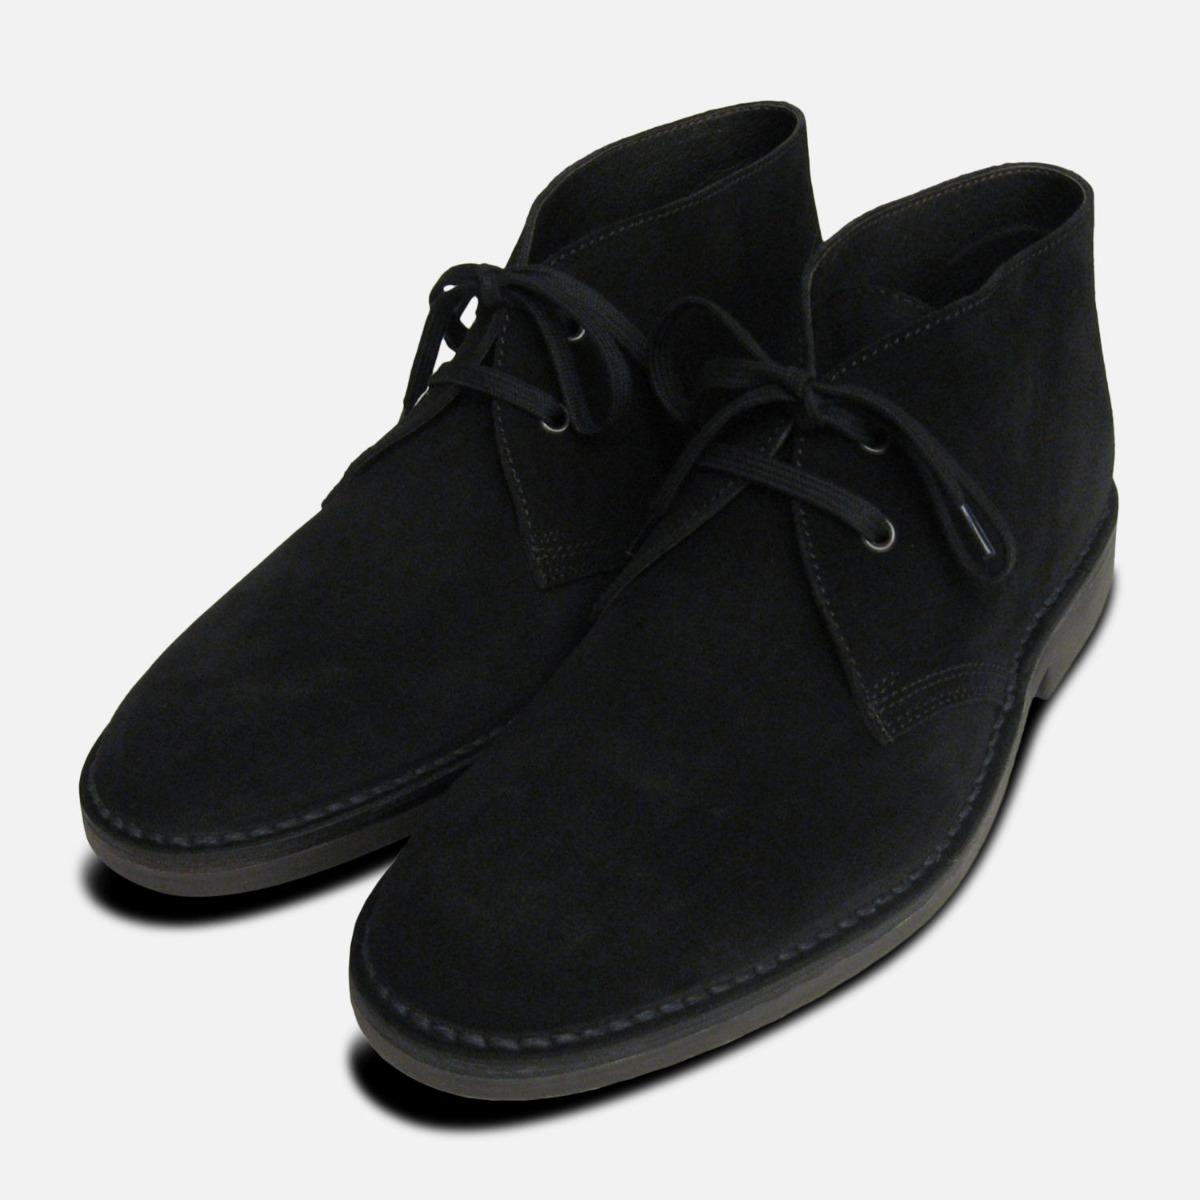 mens black suede desert boots uk